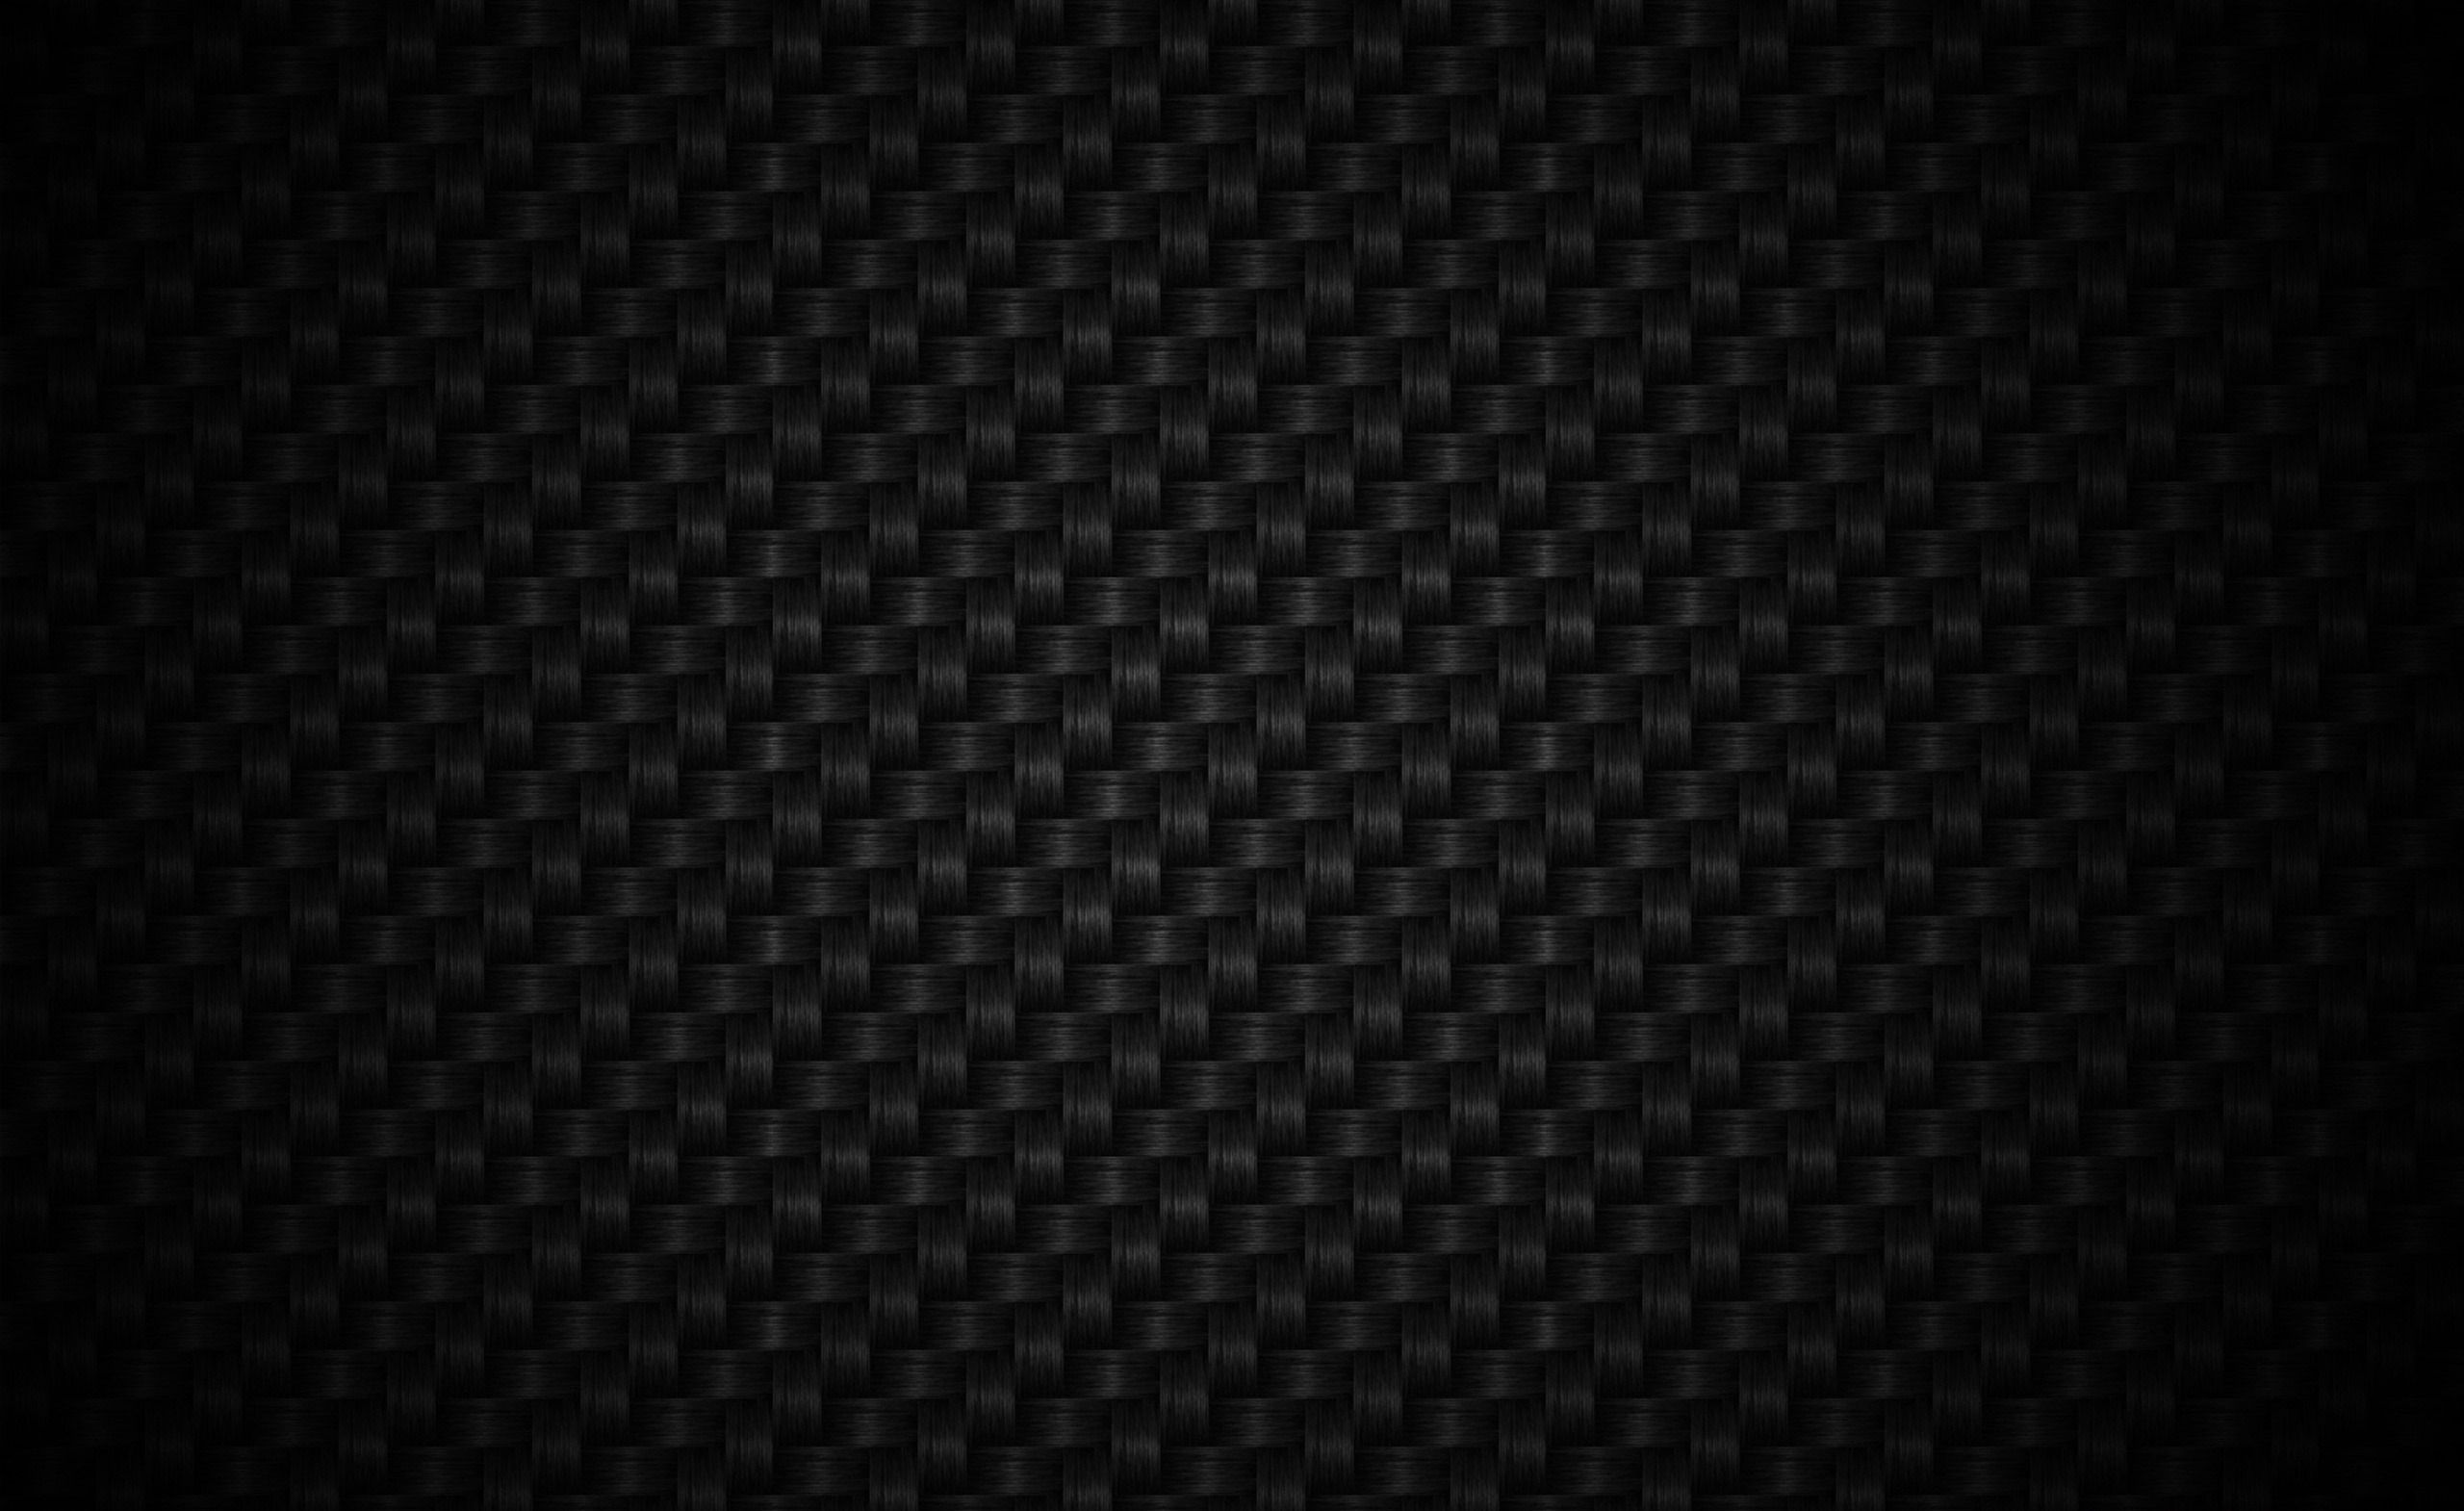 Black-Wallpaper-Wallpaper-HD (1)